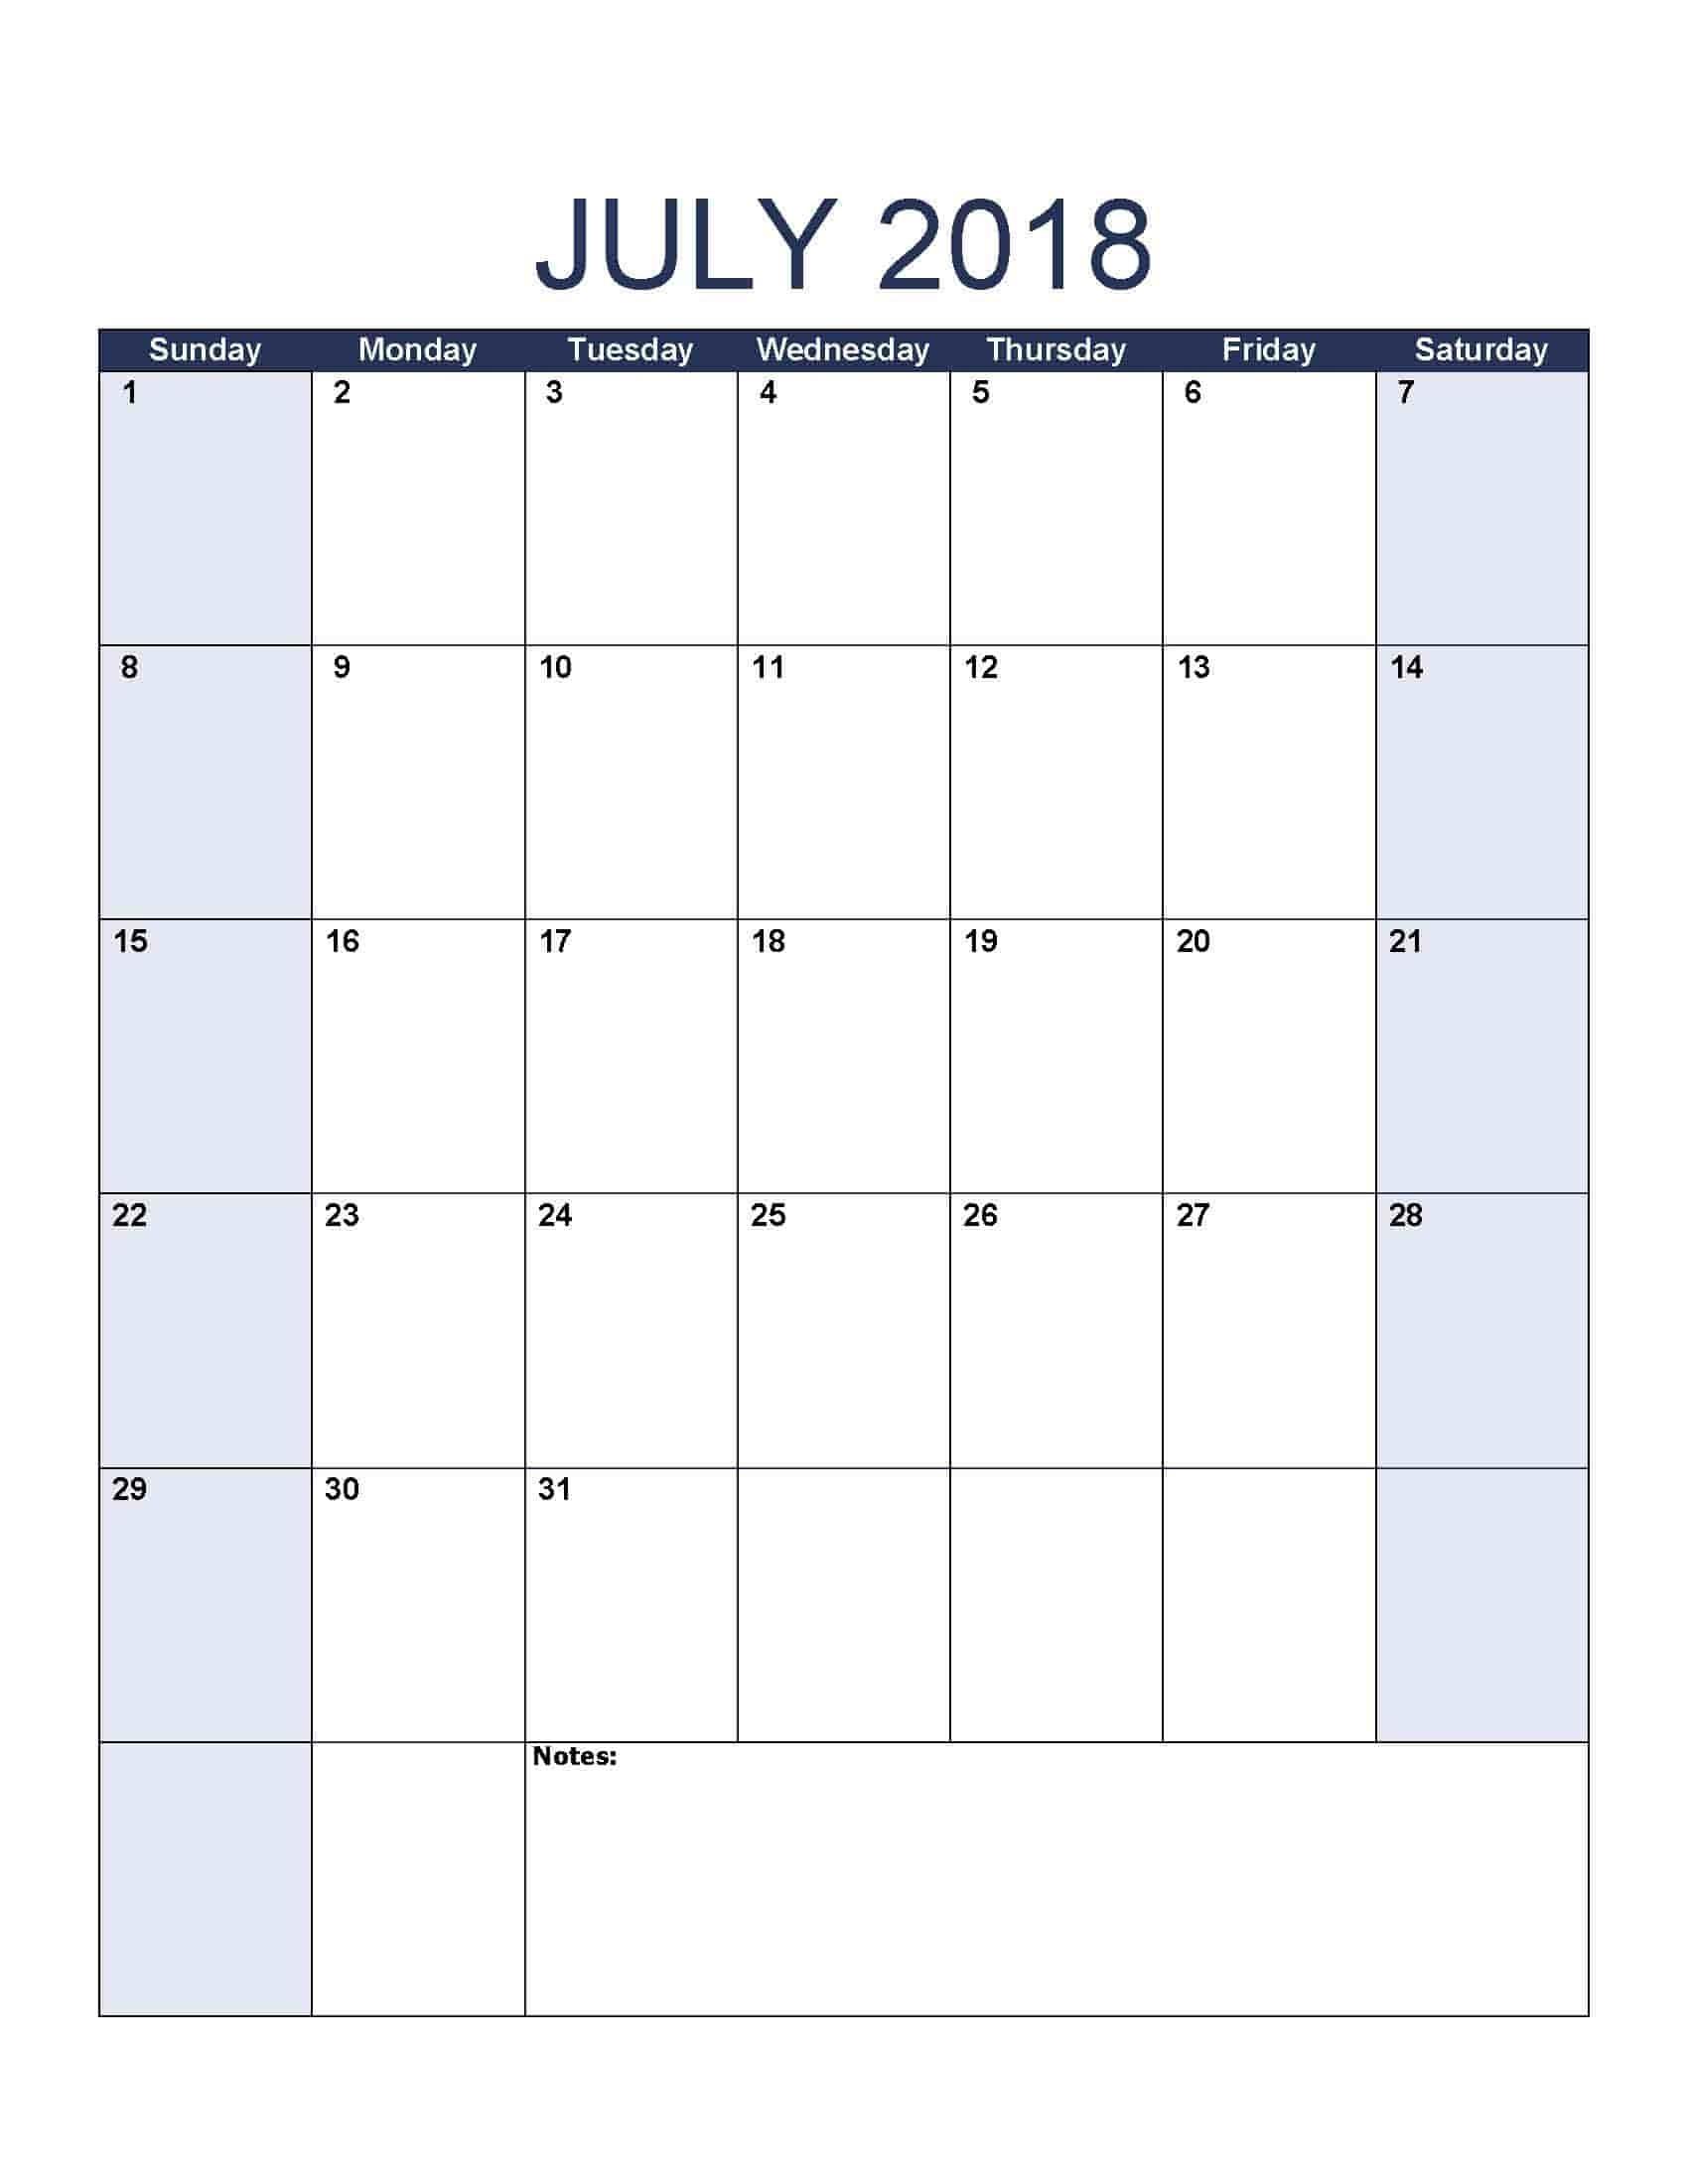 July 2018 Calendar - Free, Printable Calendar Templates-Jewish Holidays Calendar Format